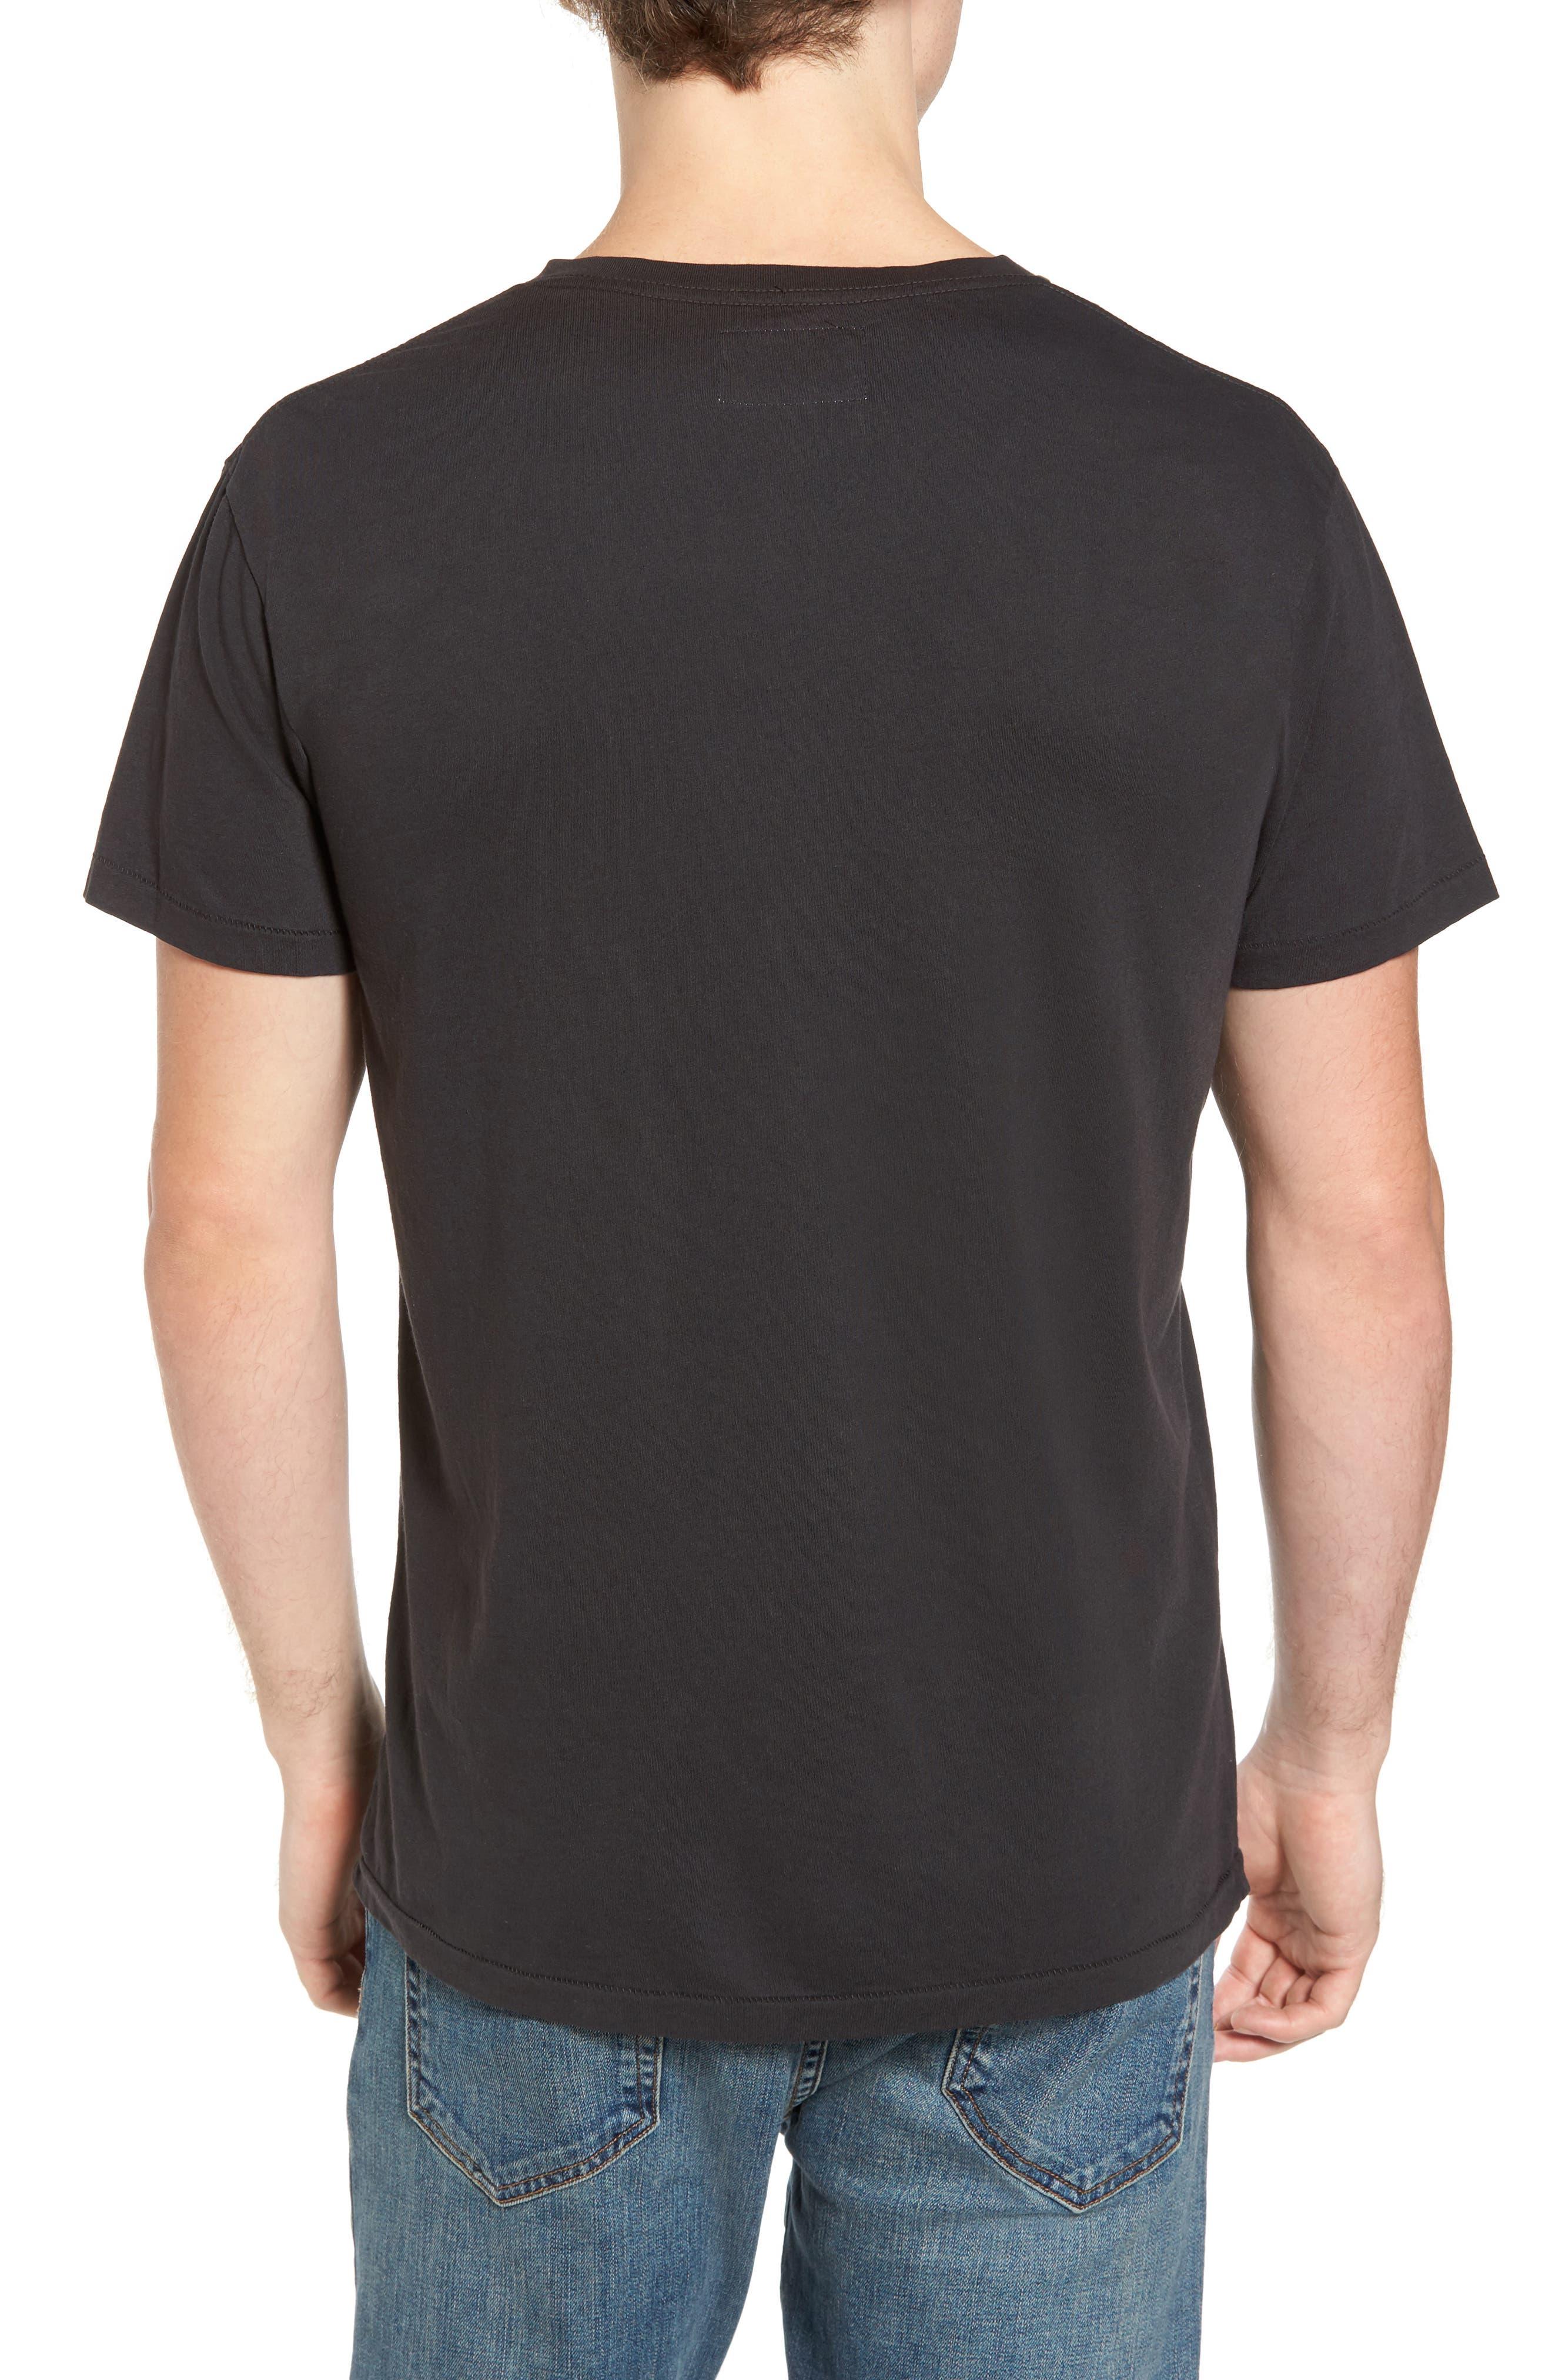 Madrugada Waves T-Shirt,                             Alternate thumbnail 2, color,                             V Black